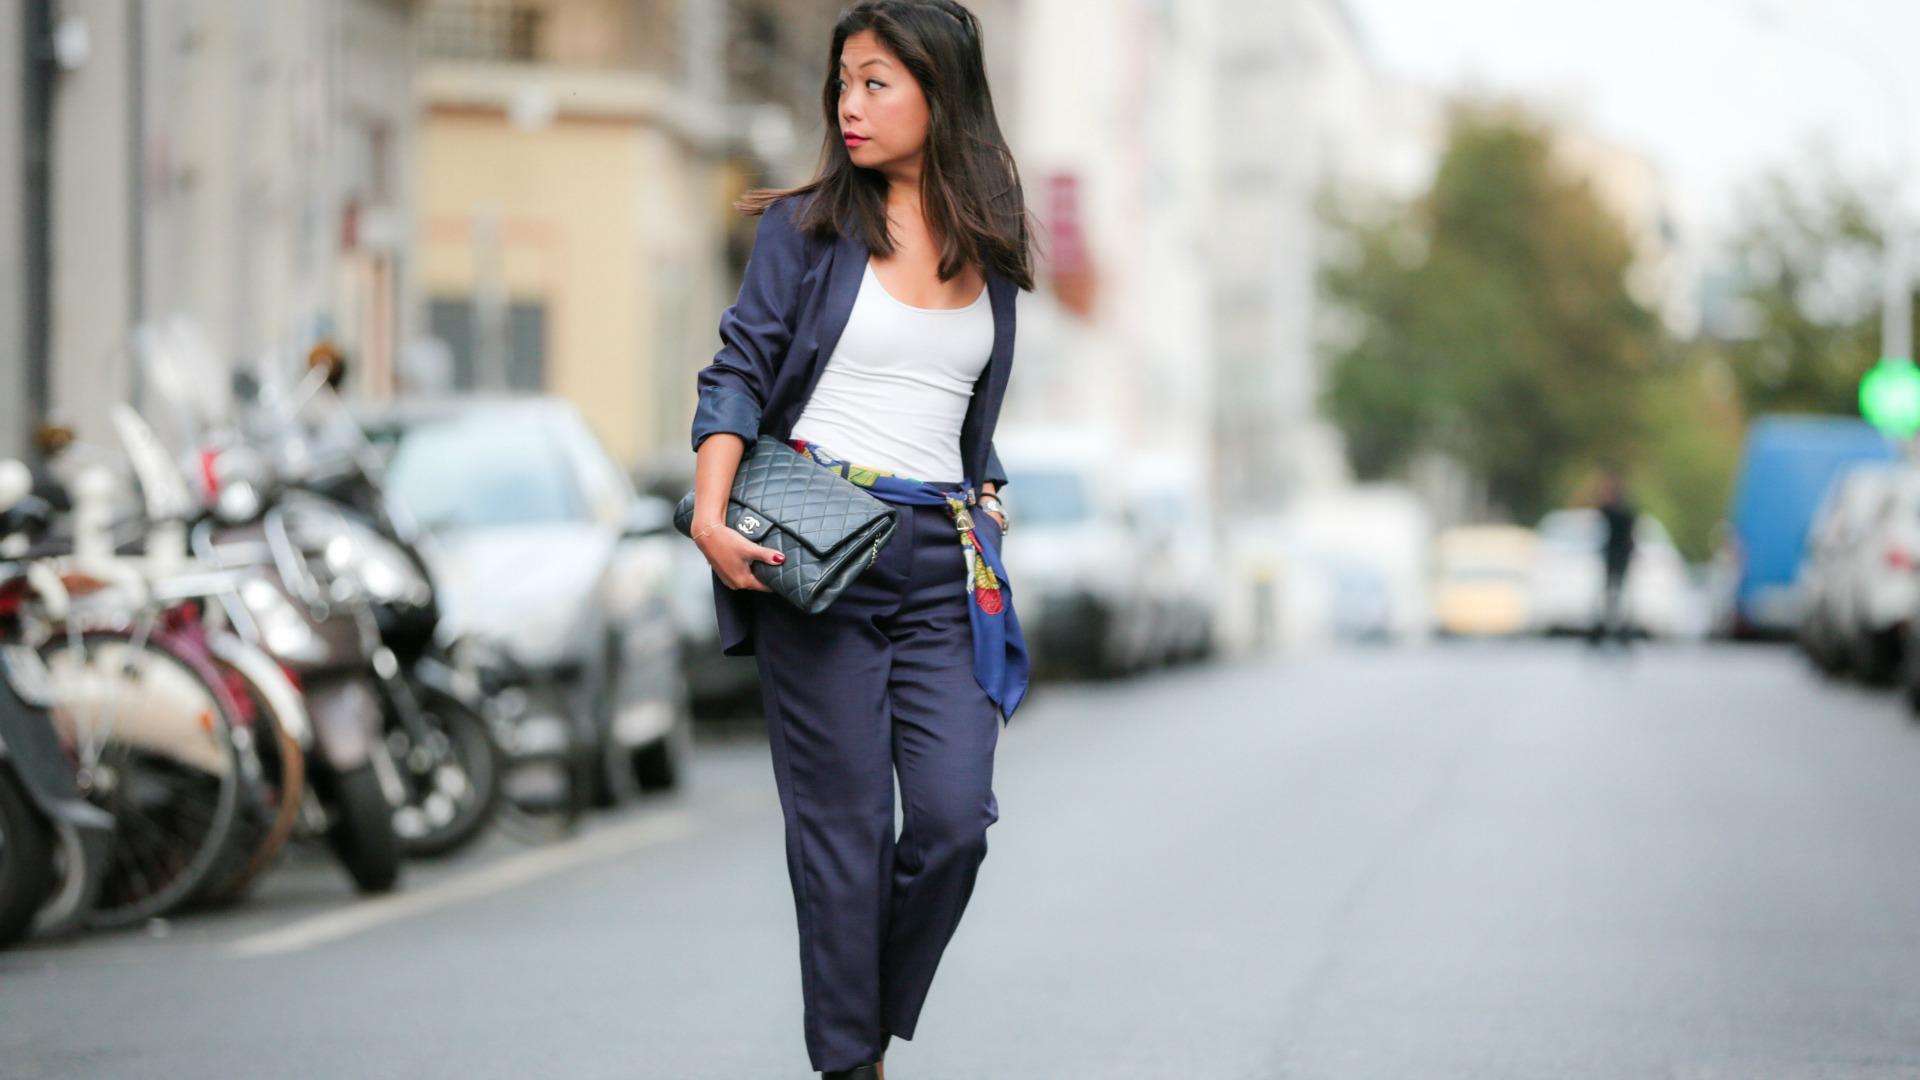 Photo Credit: Google Images / Stylecaster.com